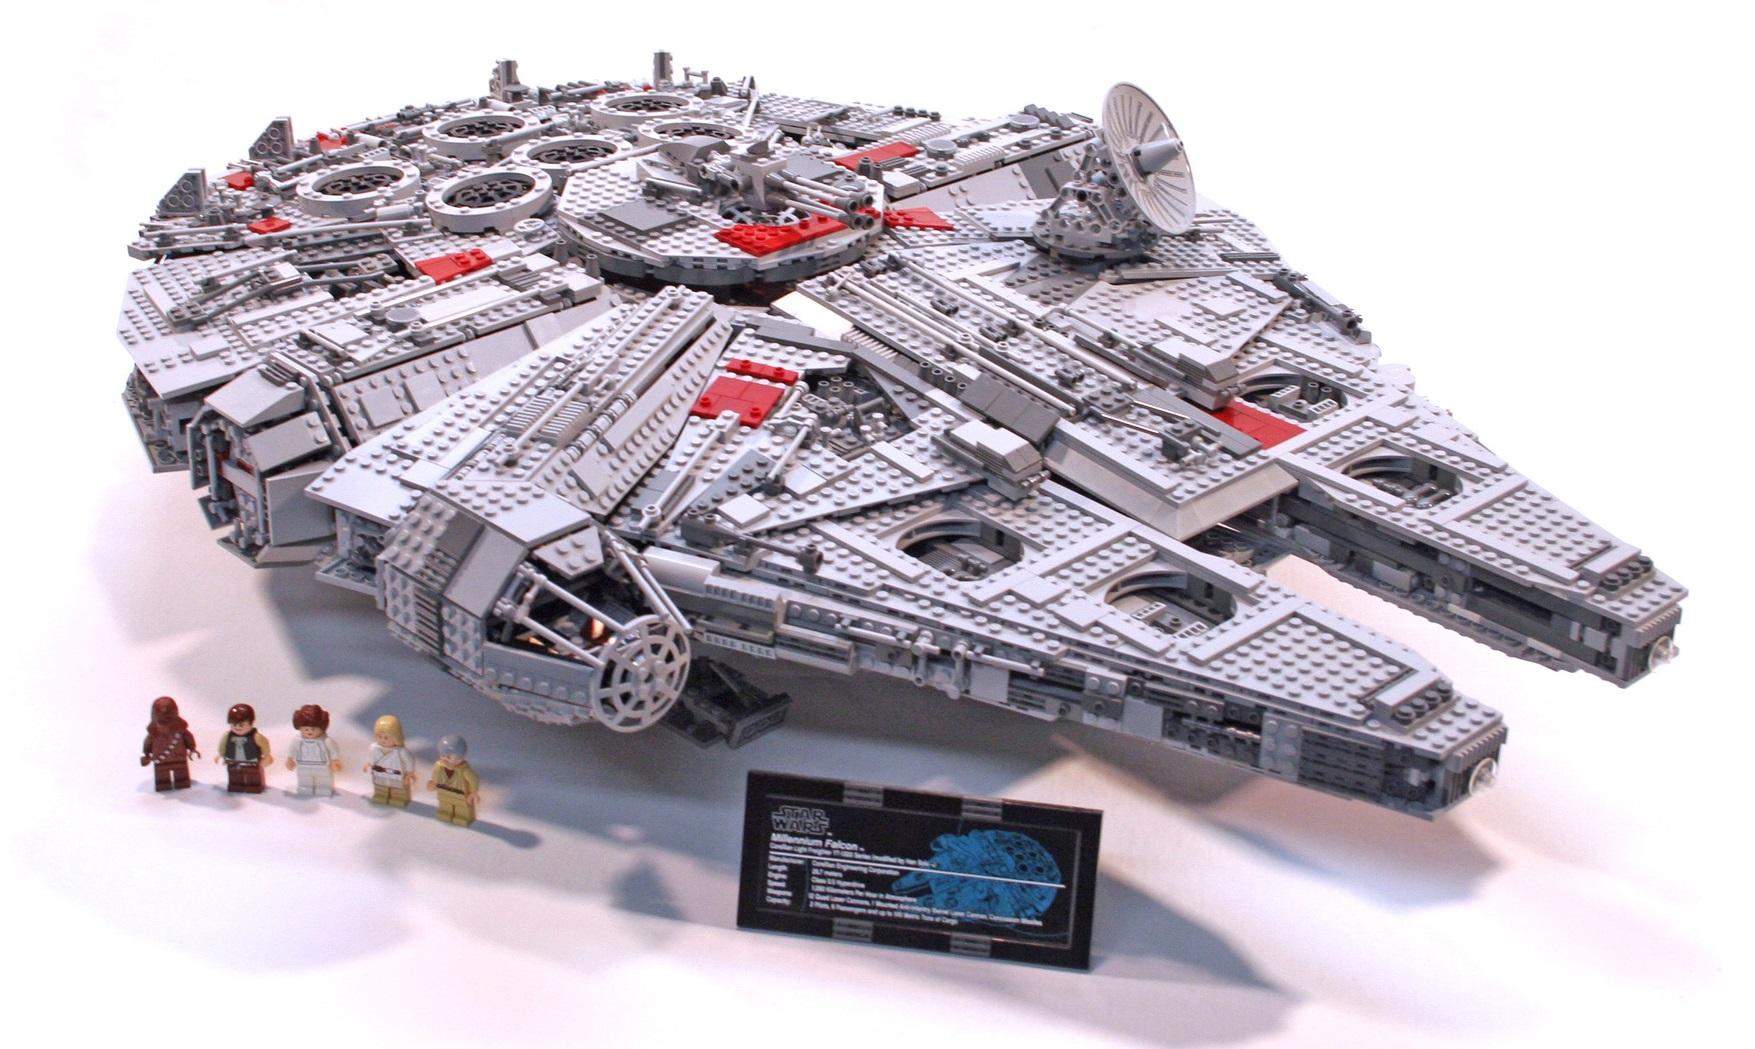 LEGO 10197 Ultimate Collector's Millennium Falcon